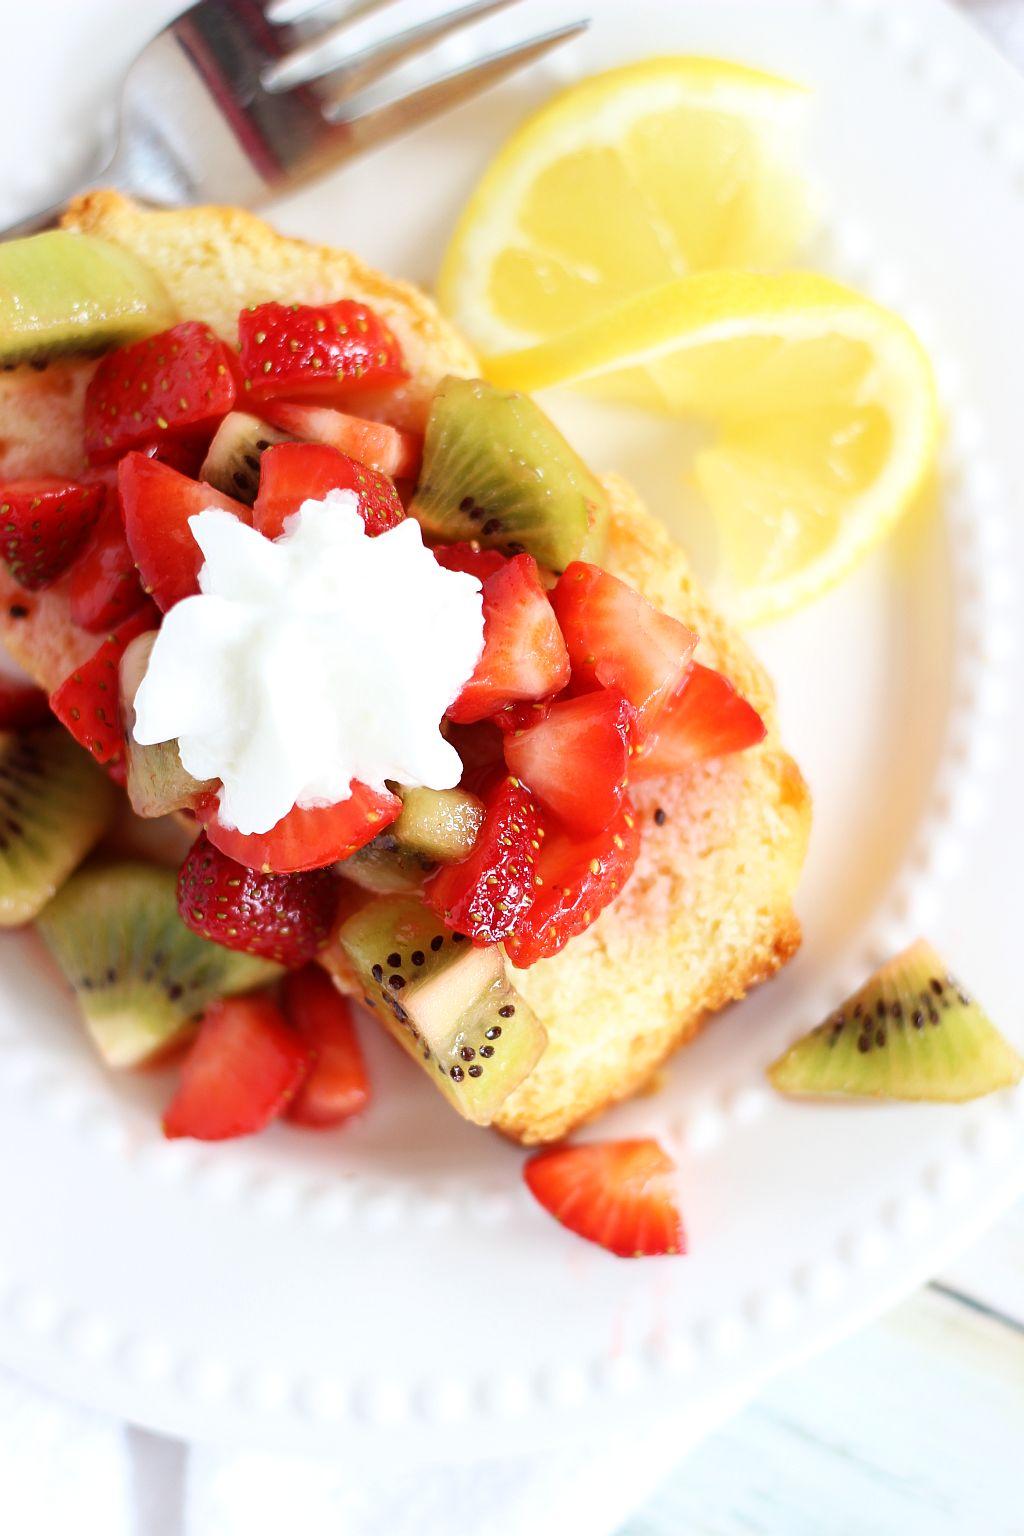 Lemon Pound Cake with Strawberry-Kiwi Sauce